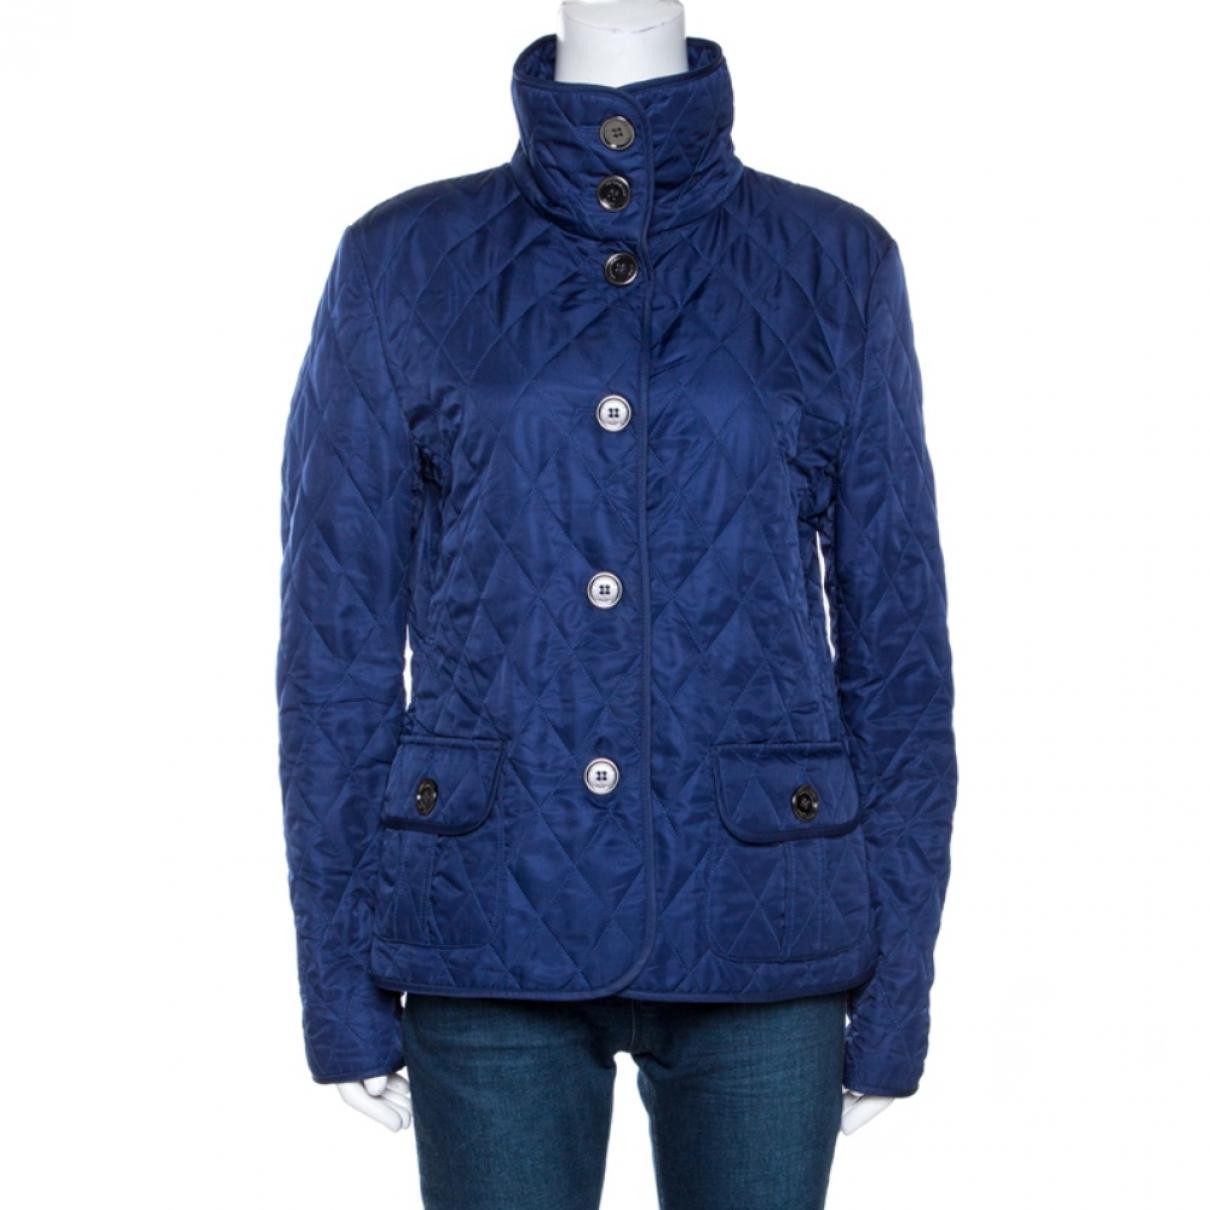 Burberry \N Jacke in  Blau Polyester